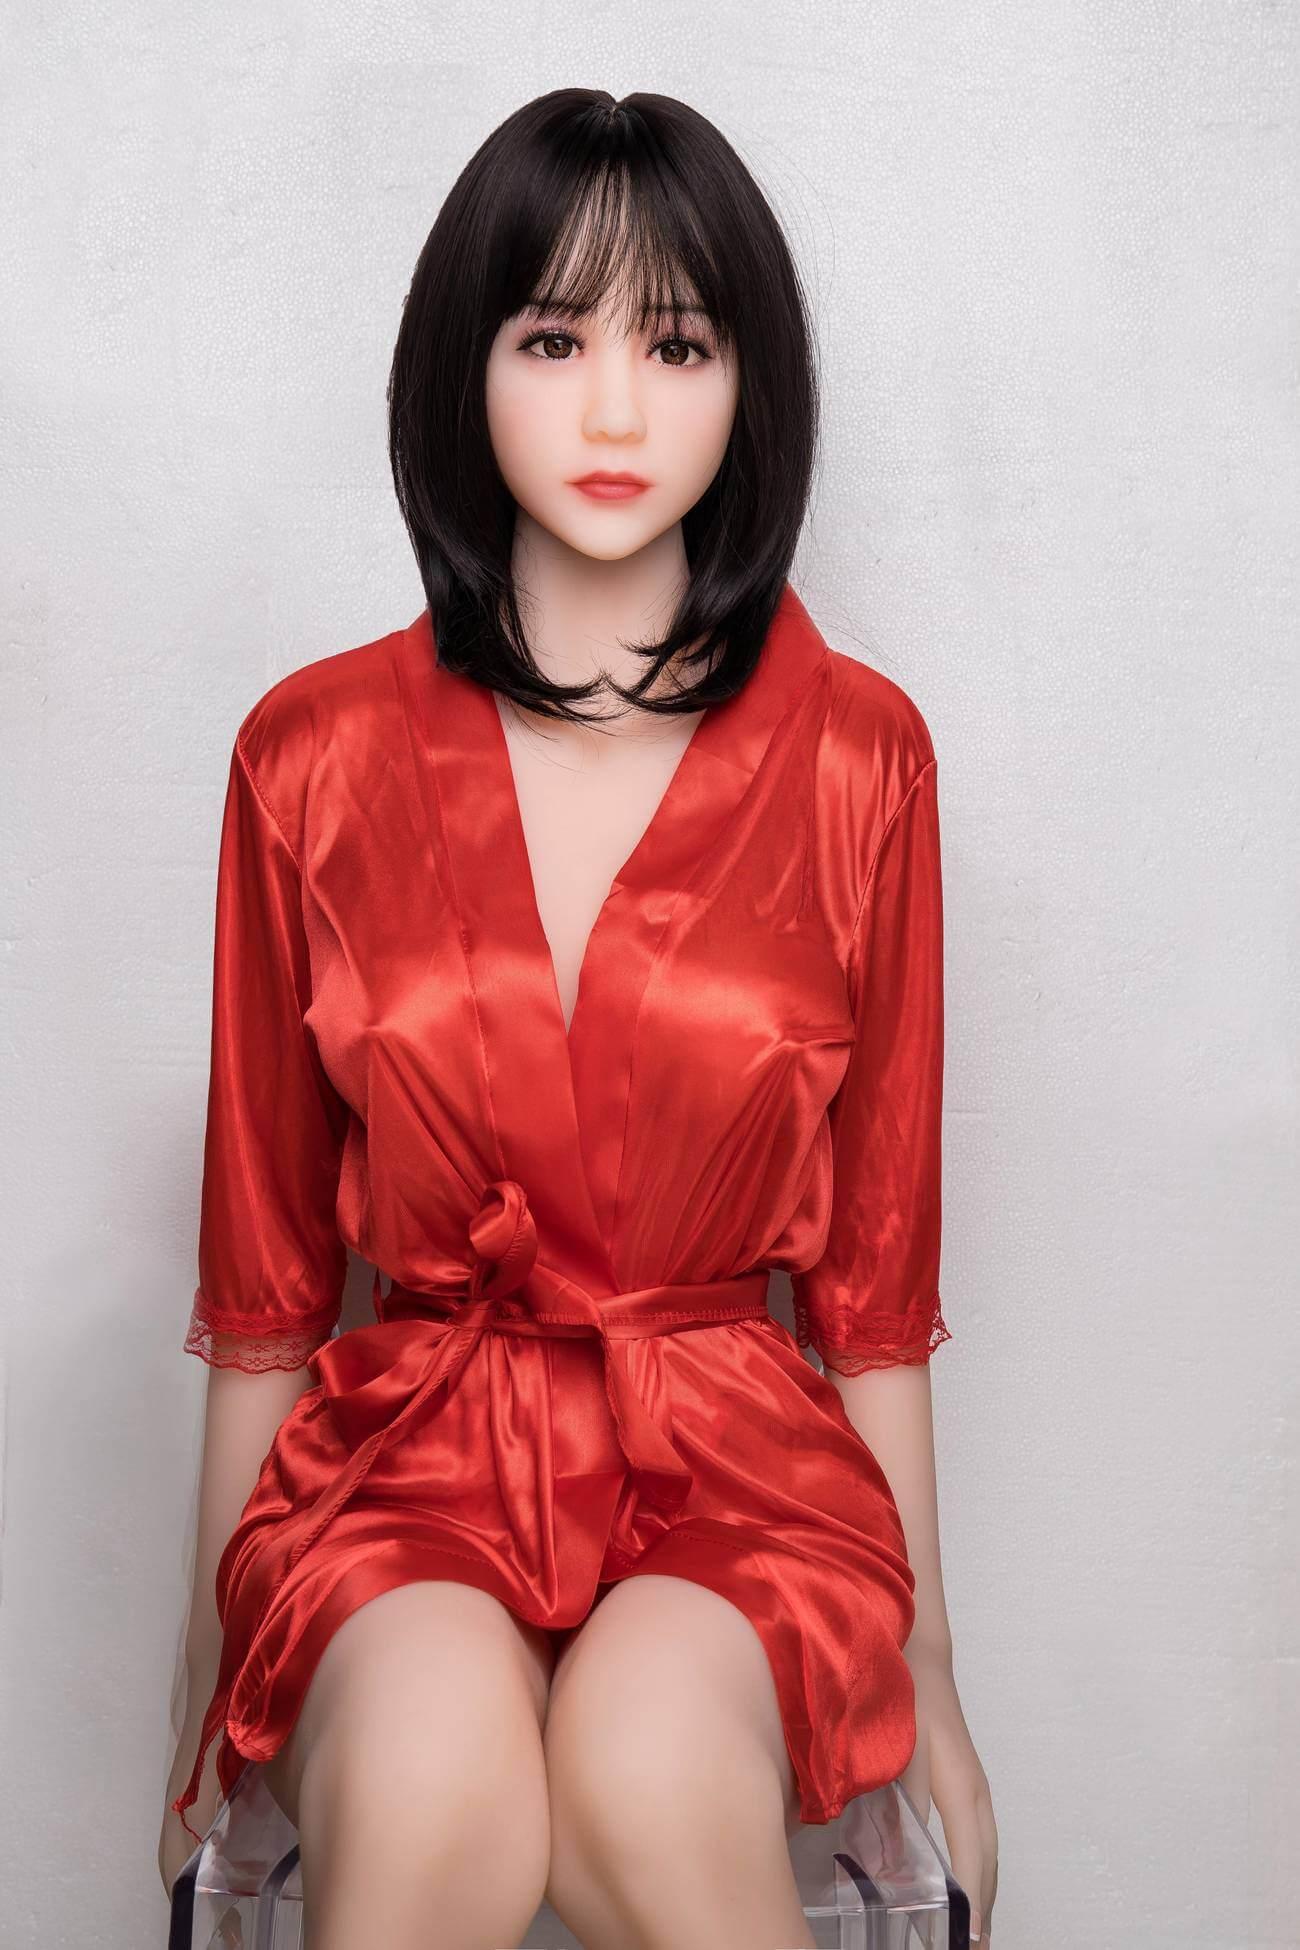 Japan Sex Doll - Lee